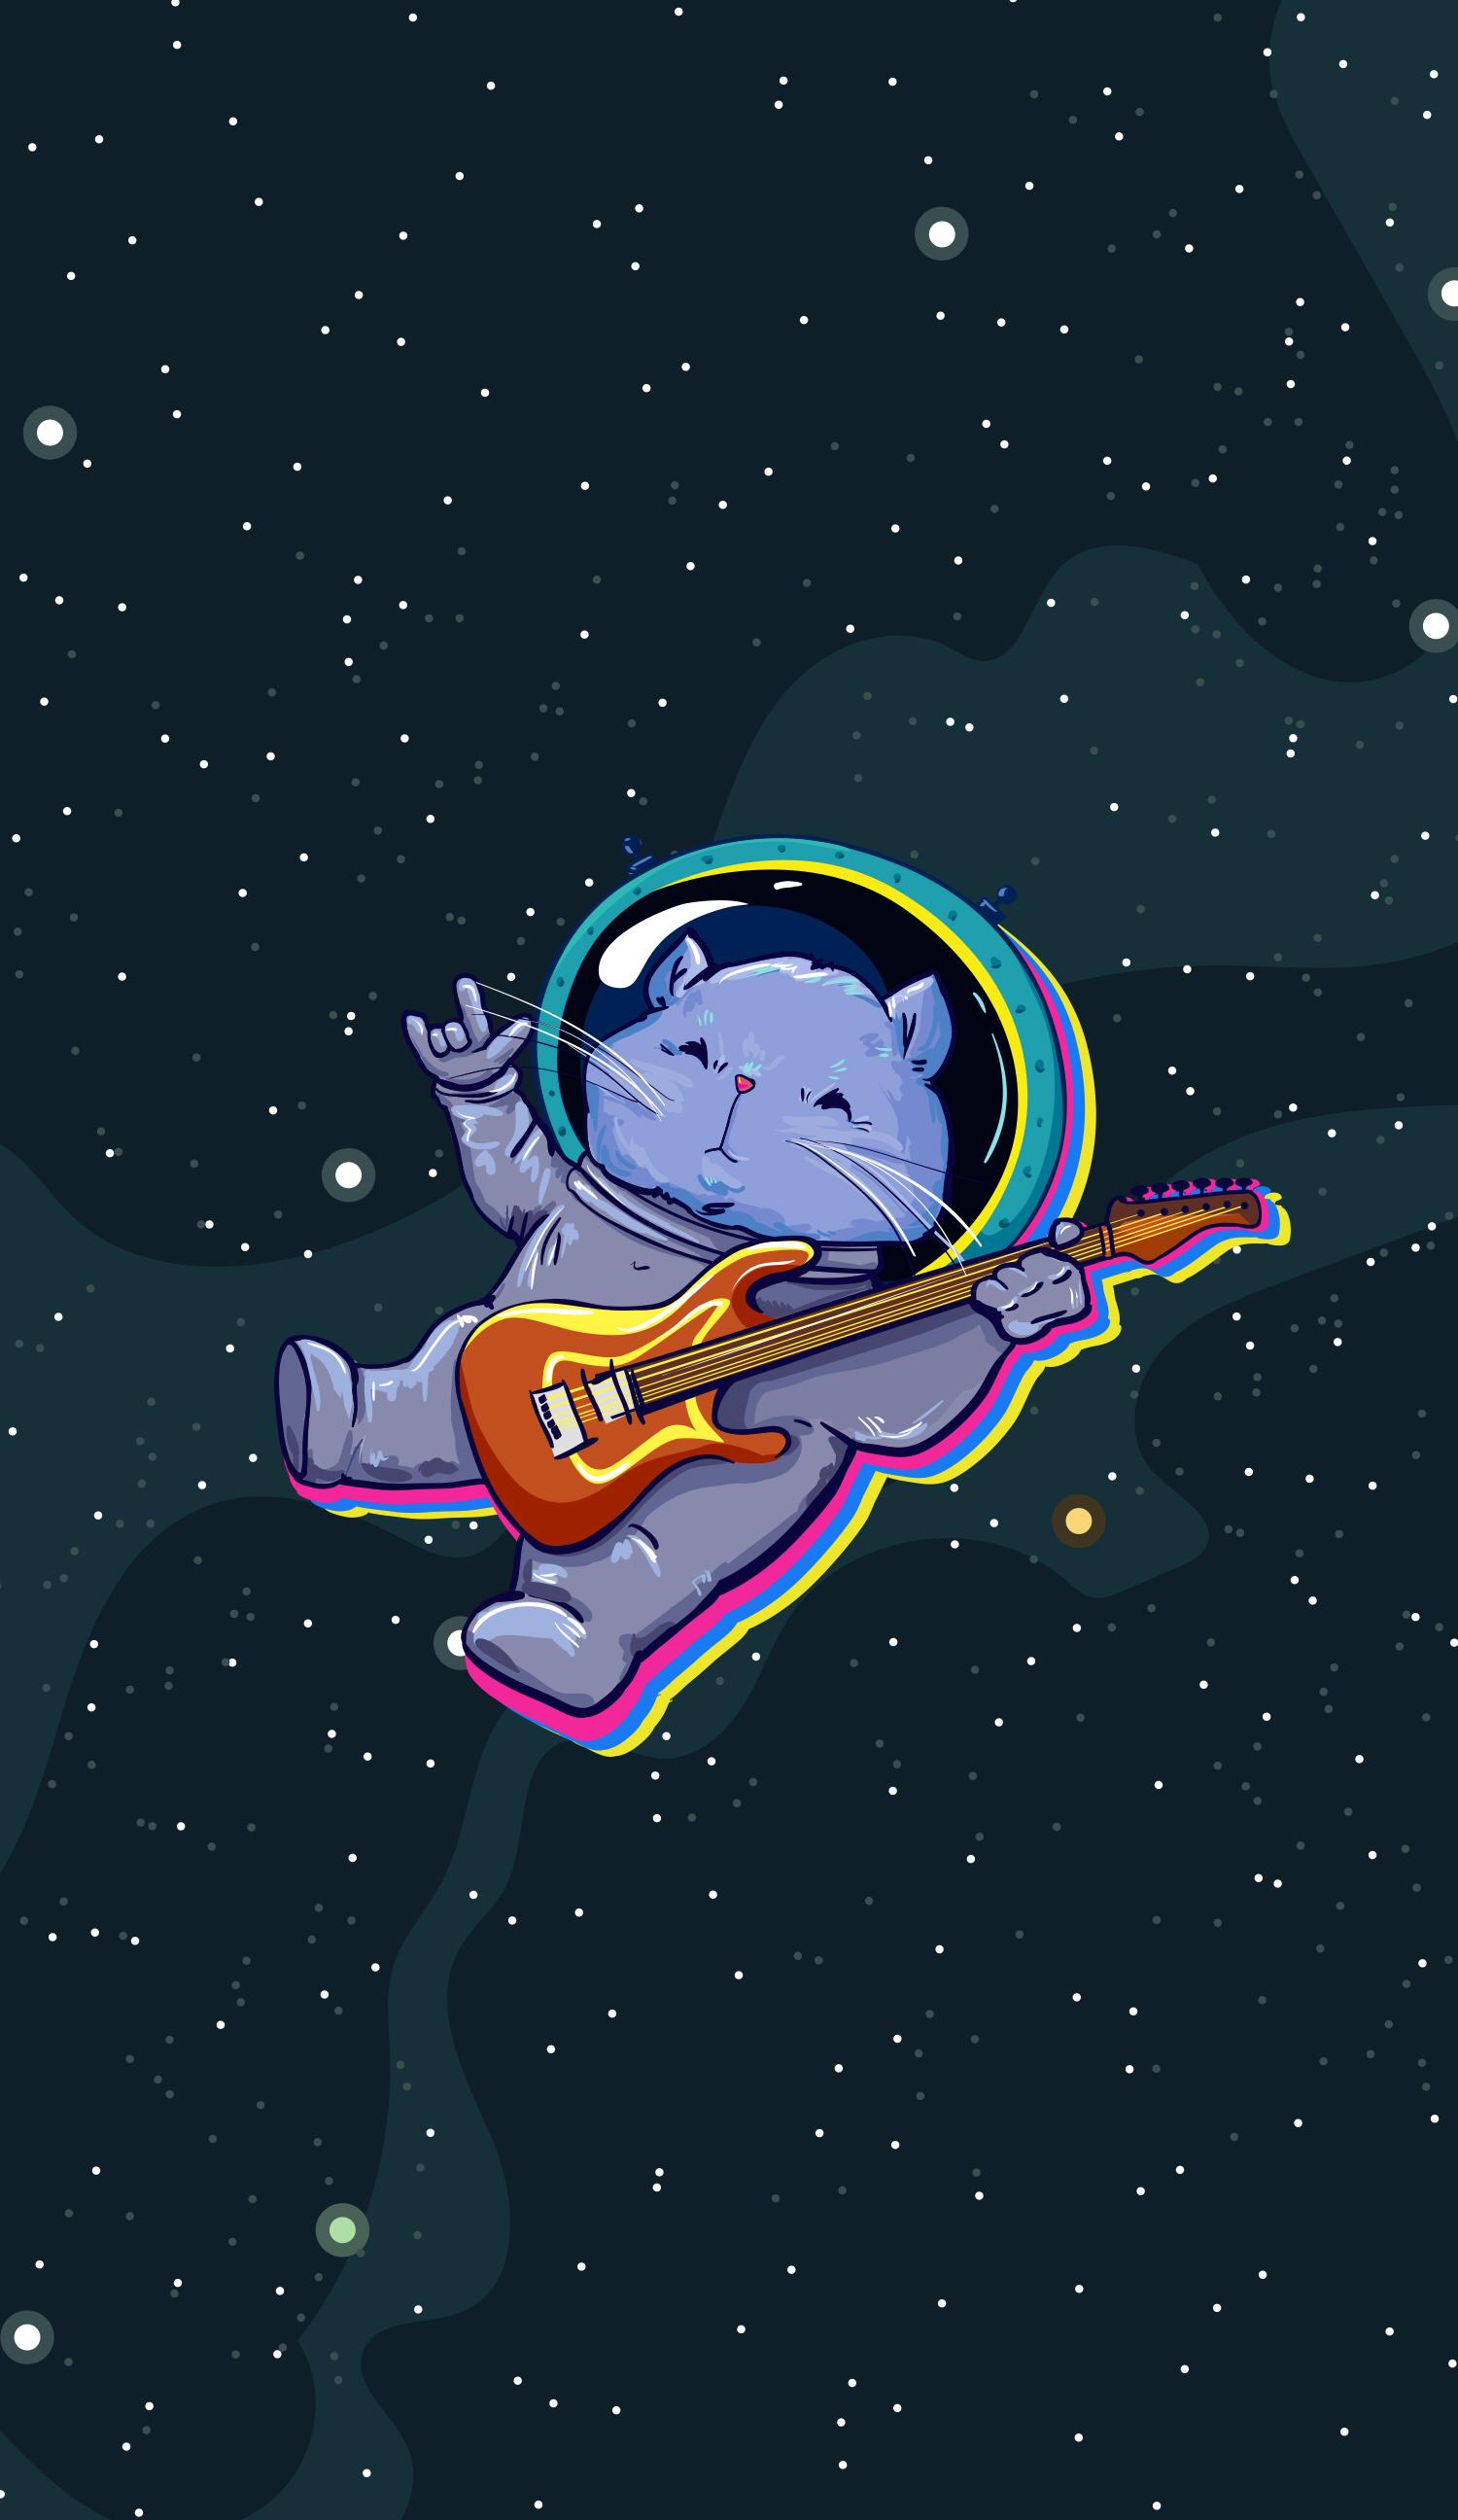 Pin By ʝeiiifeya Kach On Iphone Wallpapers Astronaut Wallpaper Trippy Wallpaper Galaxy Wallpaper